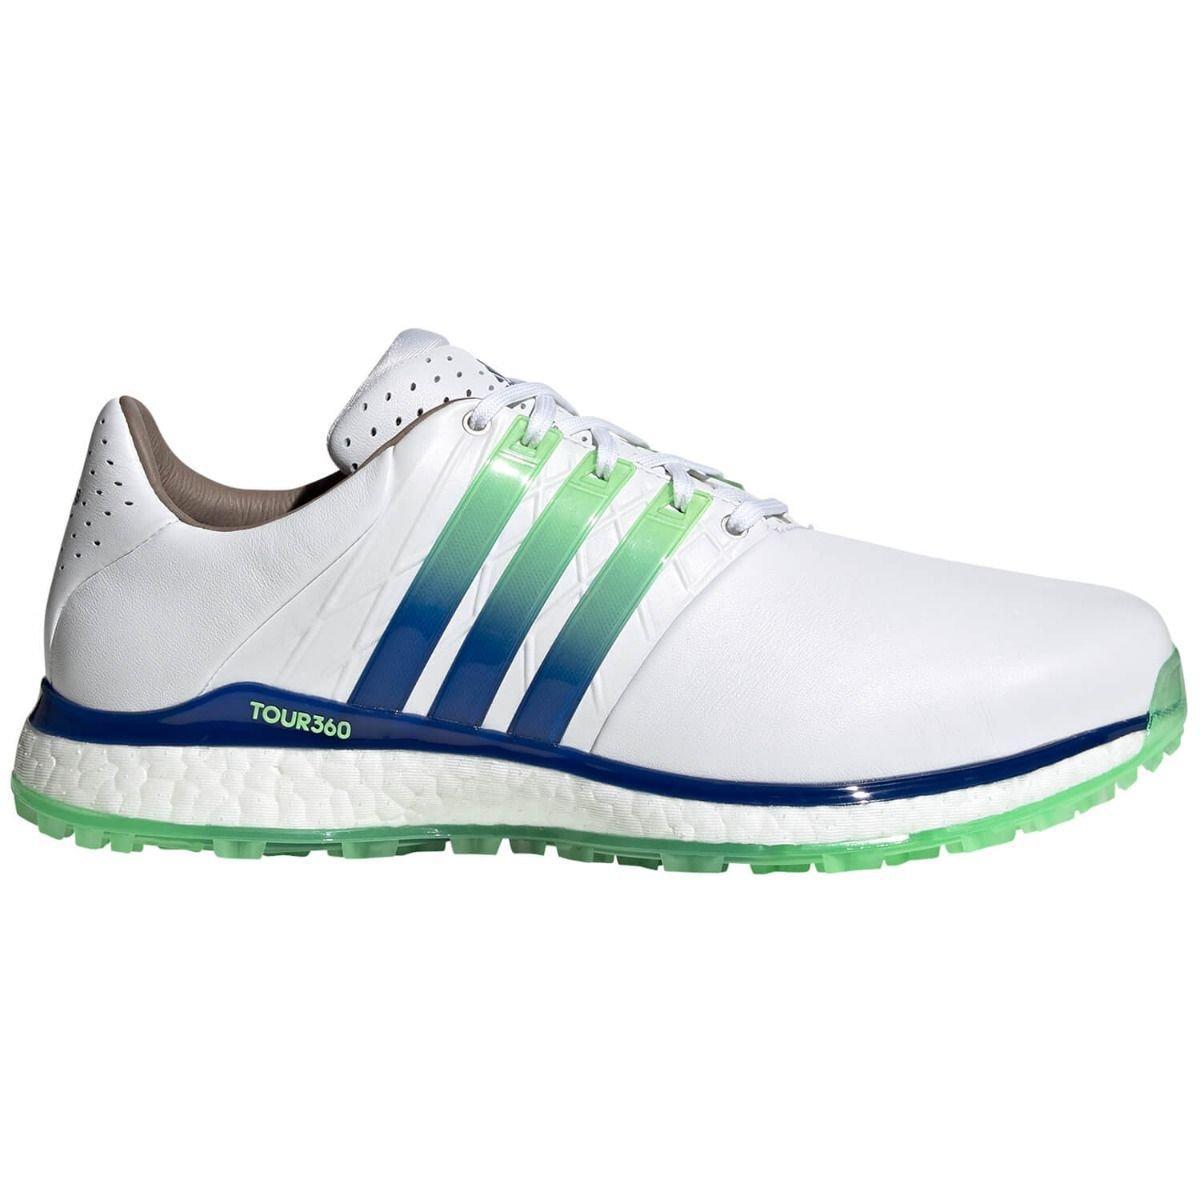 adidas Tour360 XT-SL 2.0 Spikeless Golf Shoes 2021 - White/Royal Blue/Mint